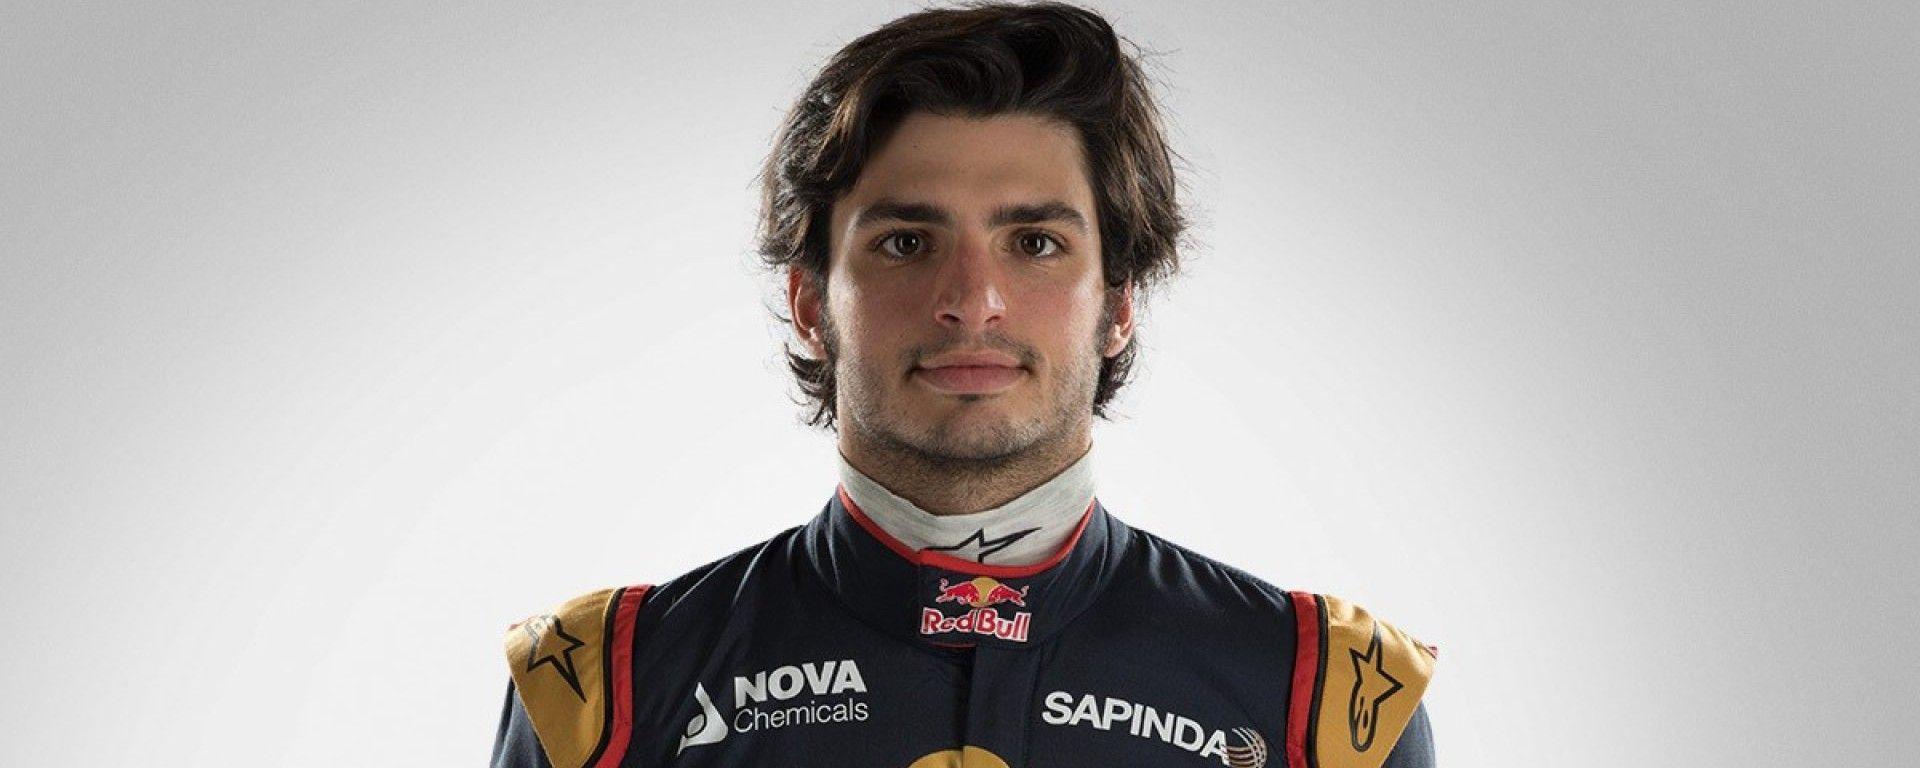 Carlos Sainz Jr #55